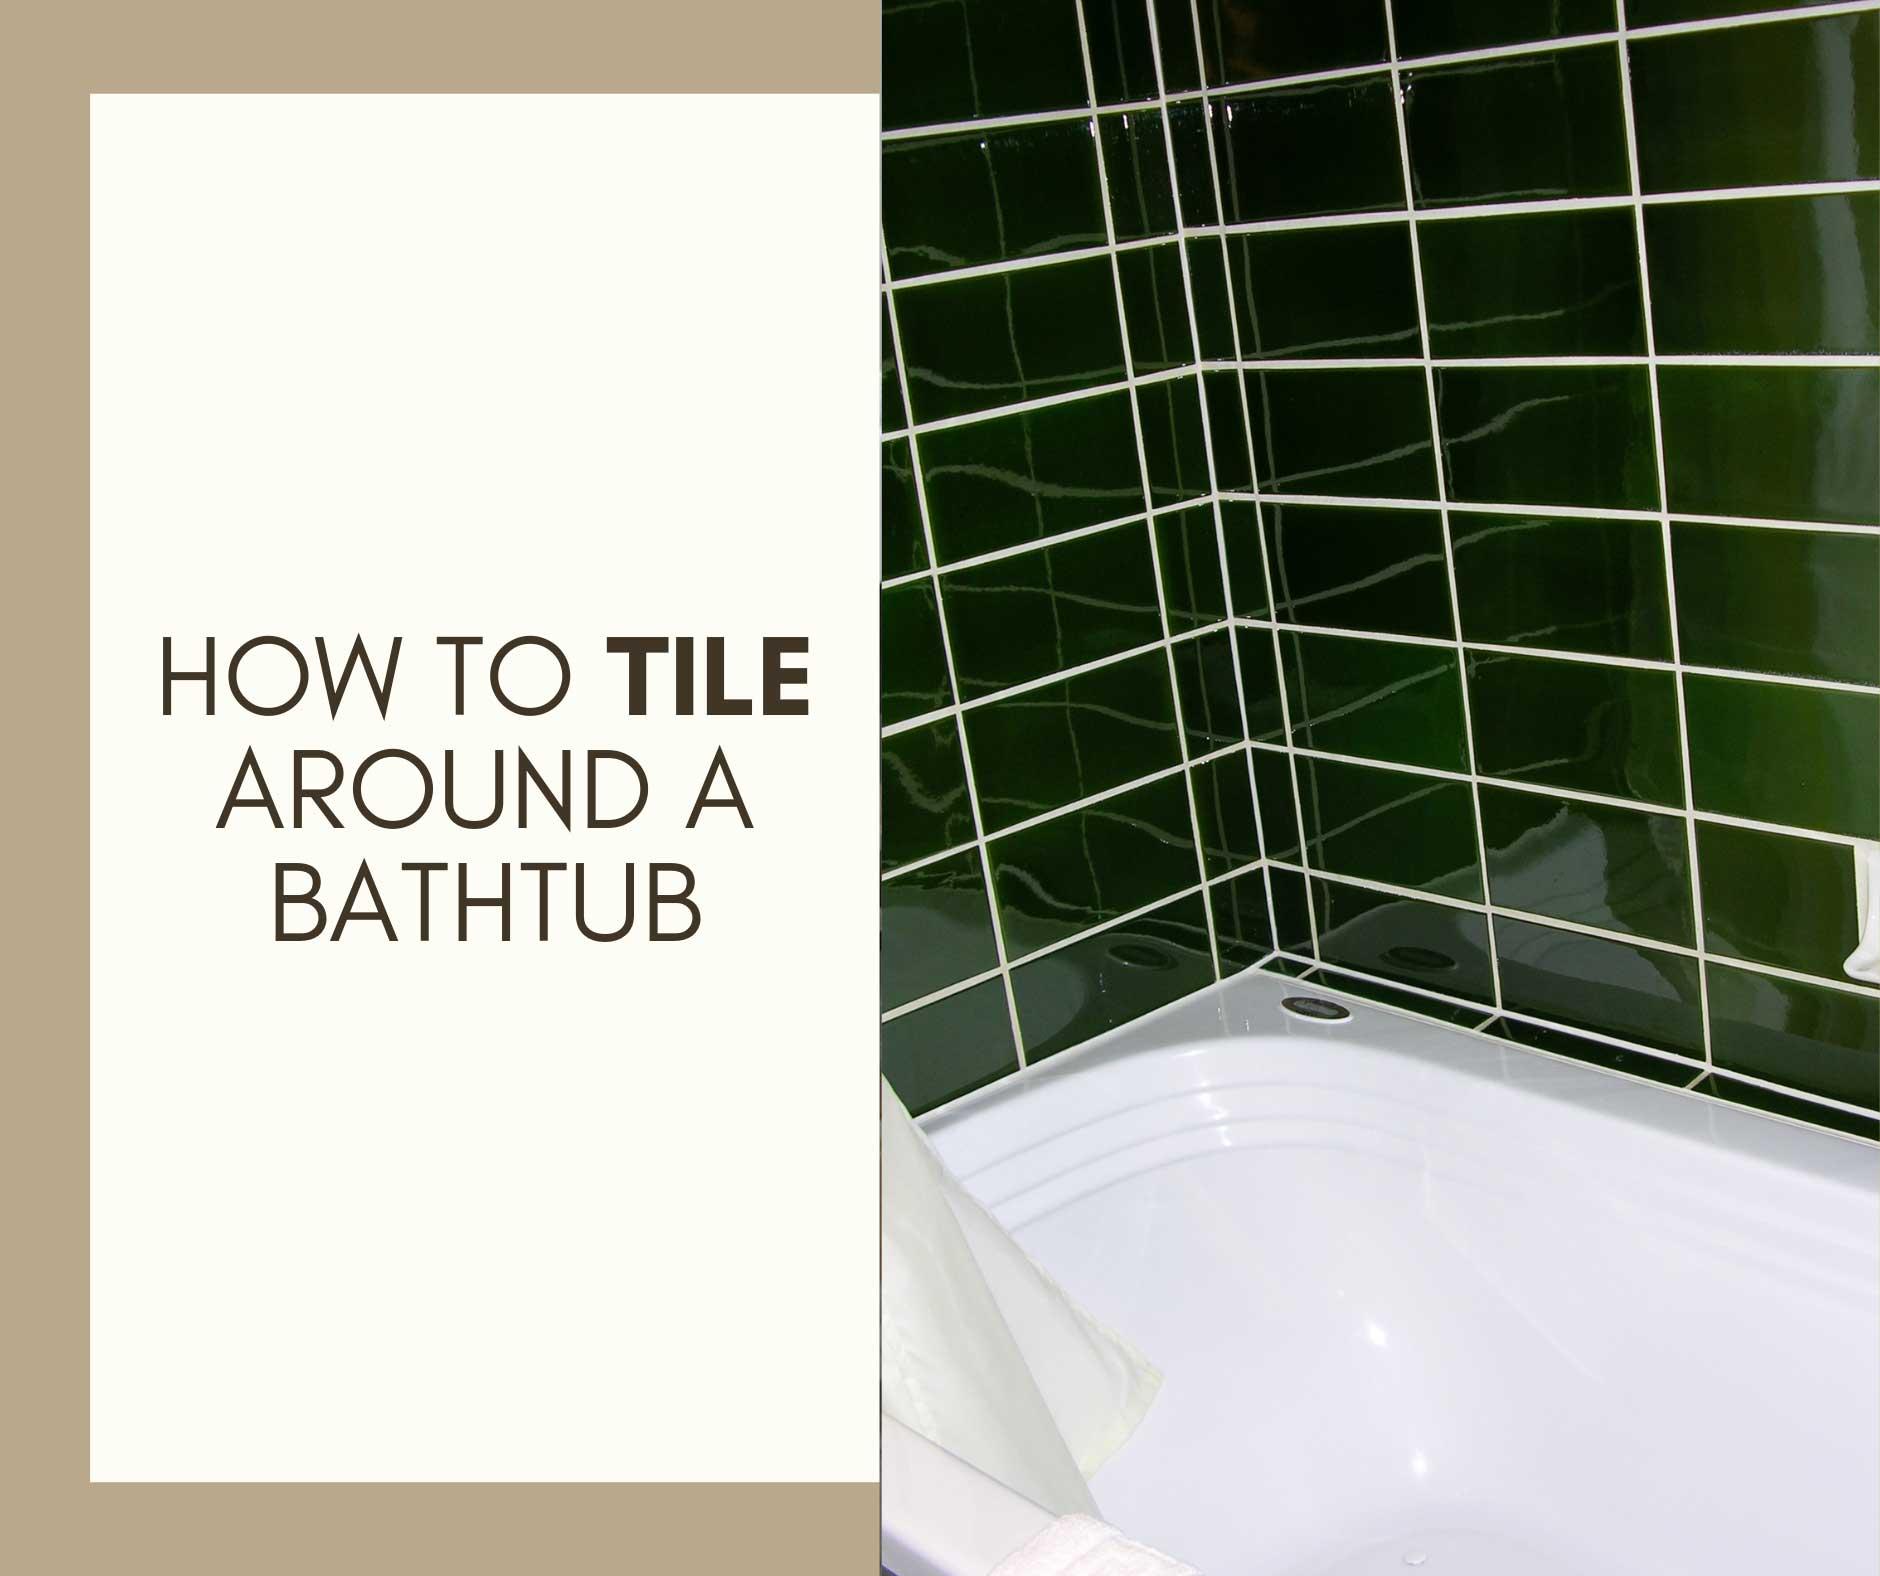 How to Tile Around a Bathtub